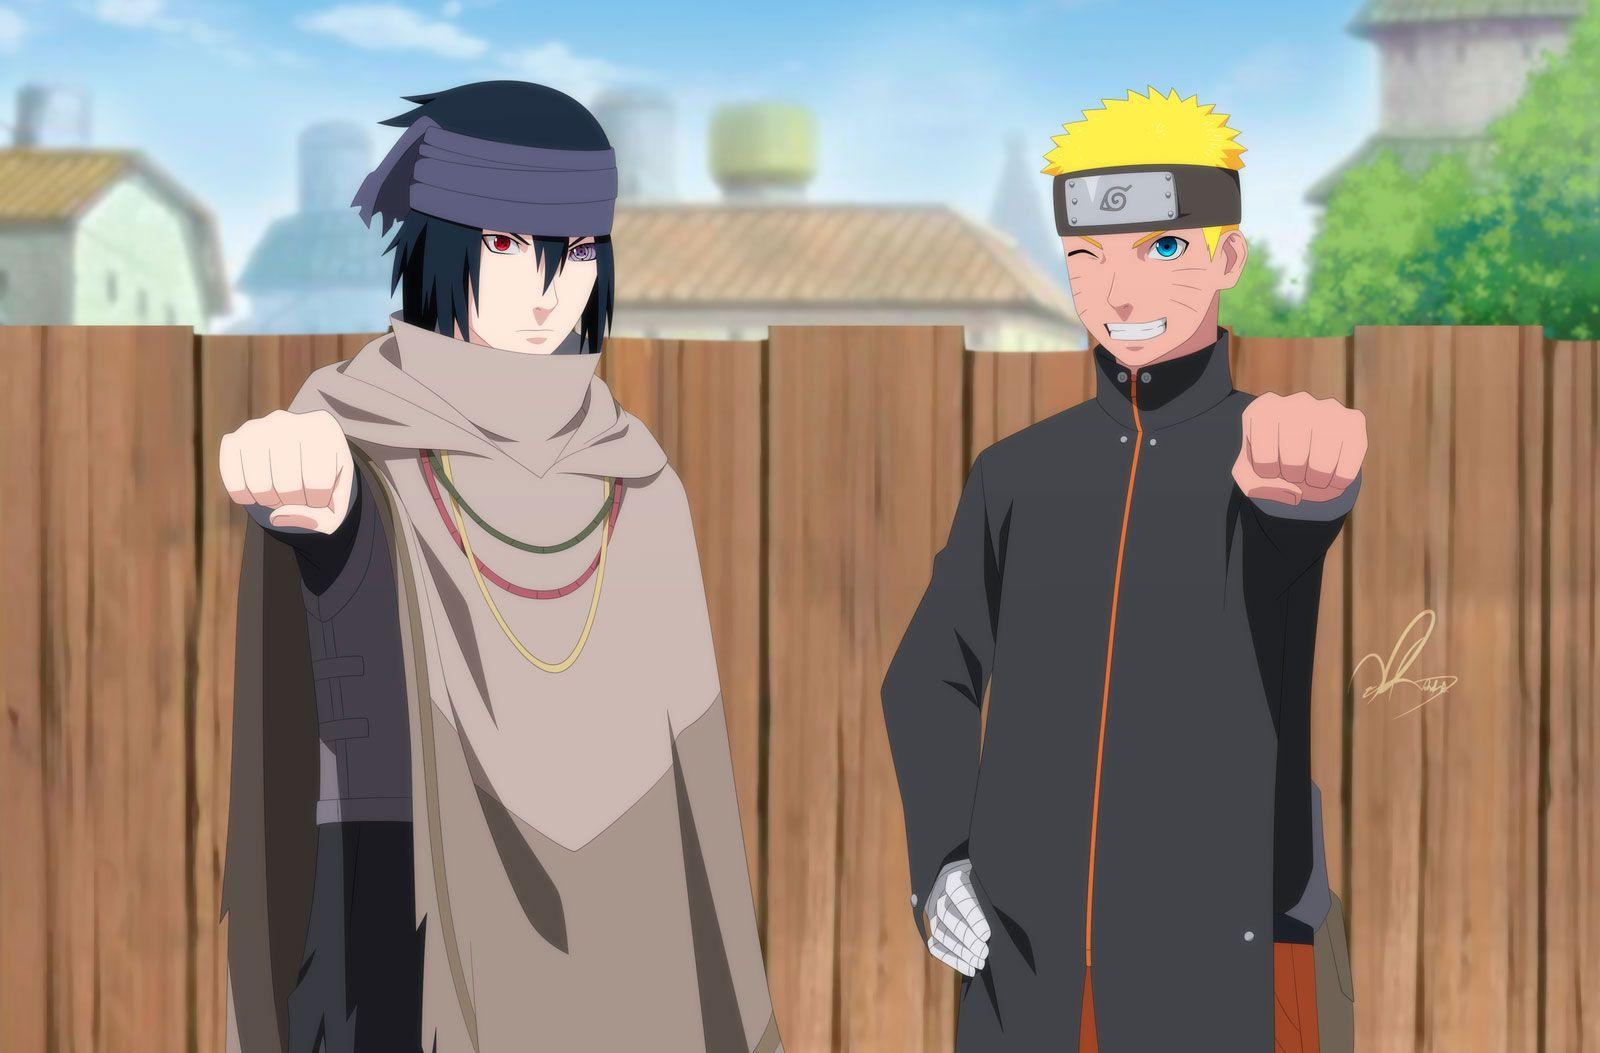 Naruto akkipuden characters the image - Naruto akkipuden ...